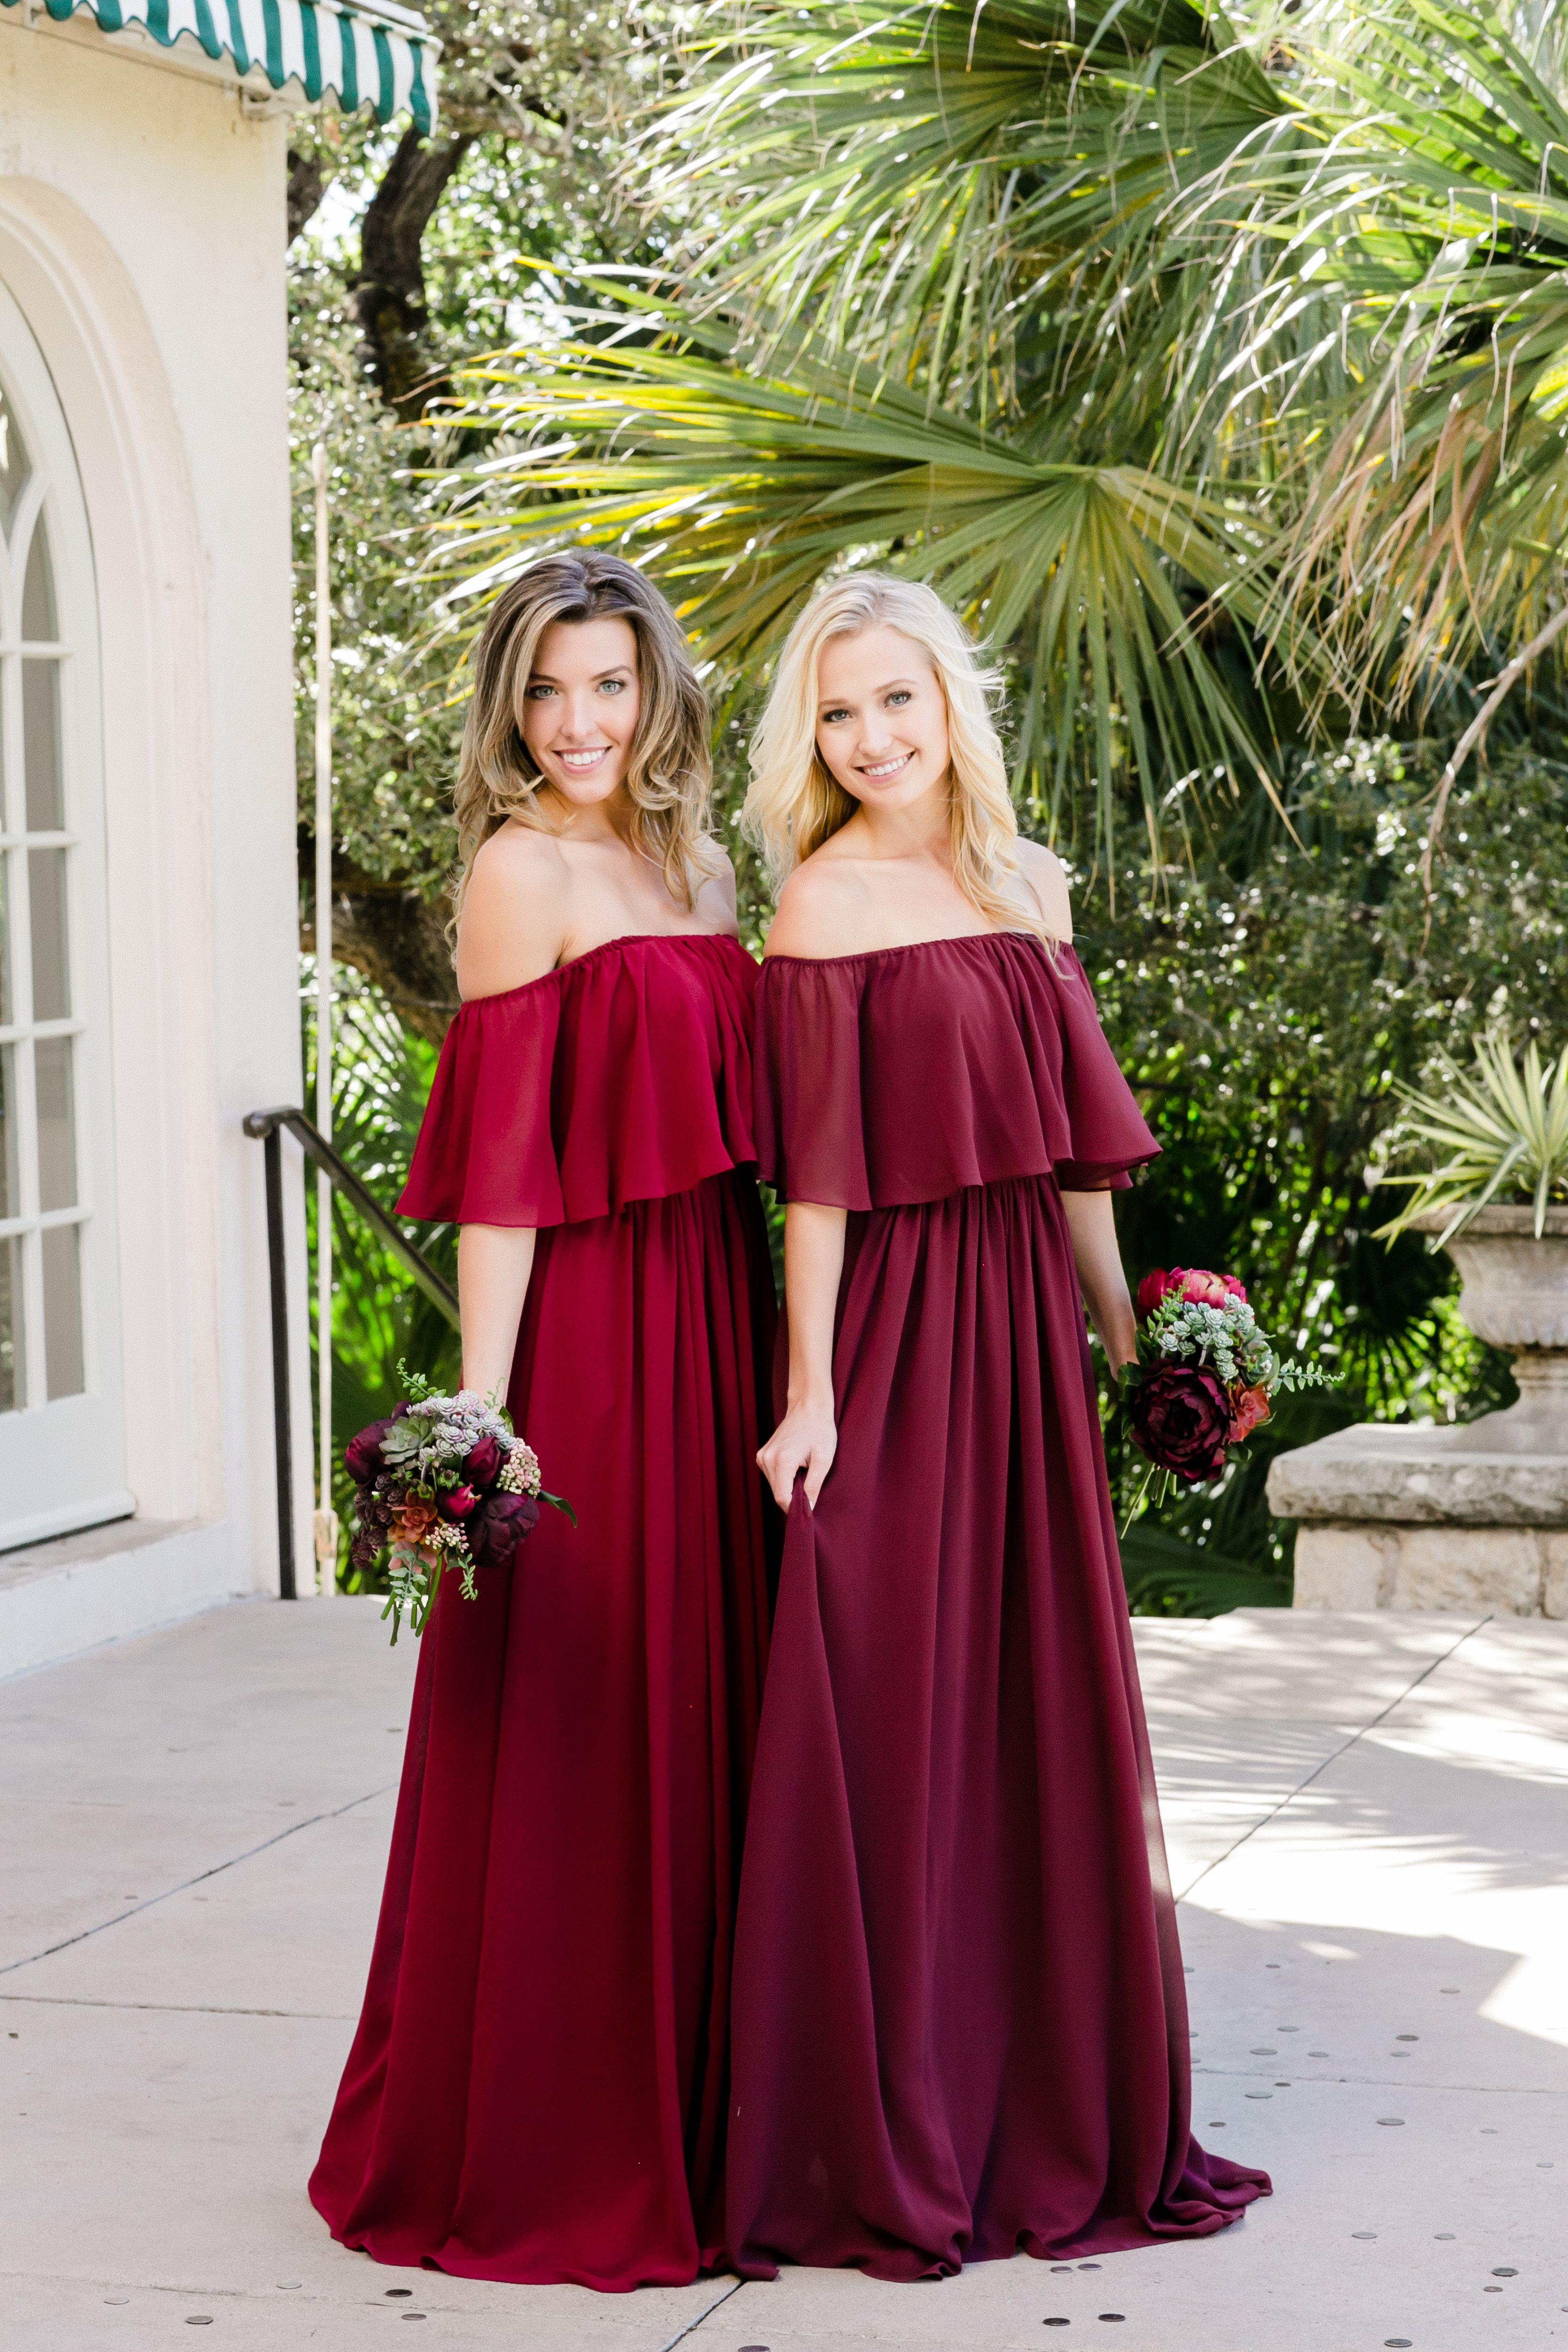 Abigail Chiffon Dress In 2020 Maroon Bridesmaid Dresses Bridesmaid Dresses Boho Bridesmaid Dresses Red Long